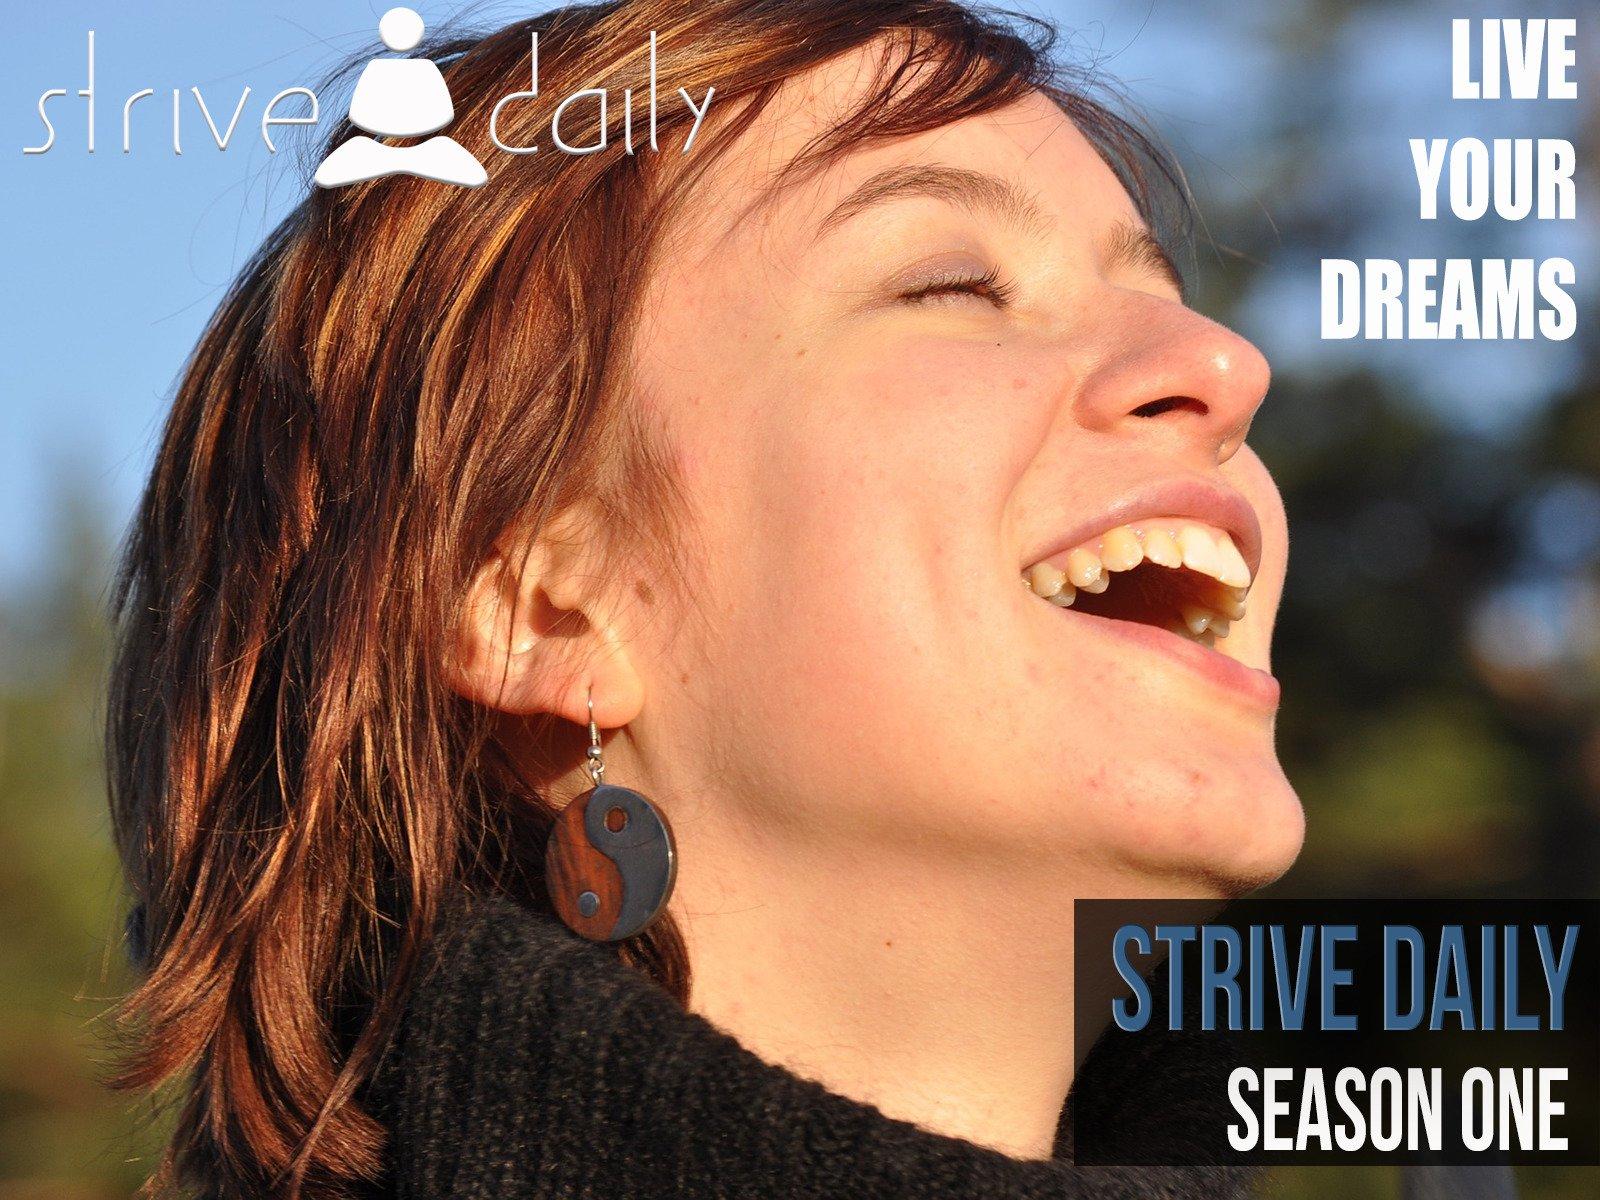 Strive Daily Season 1